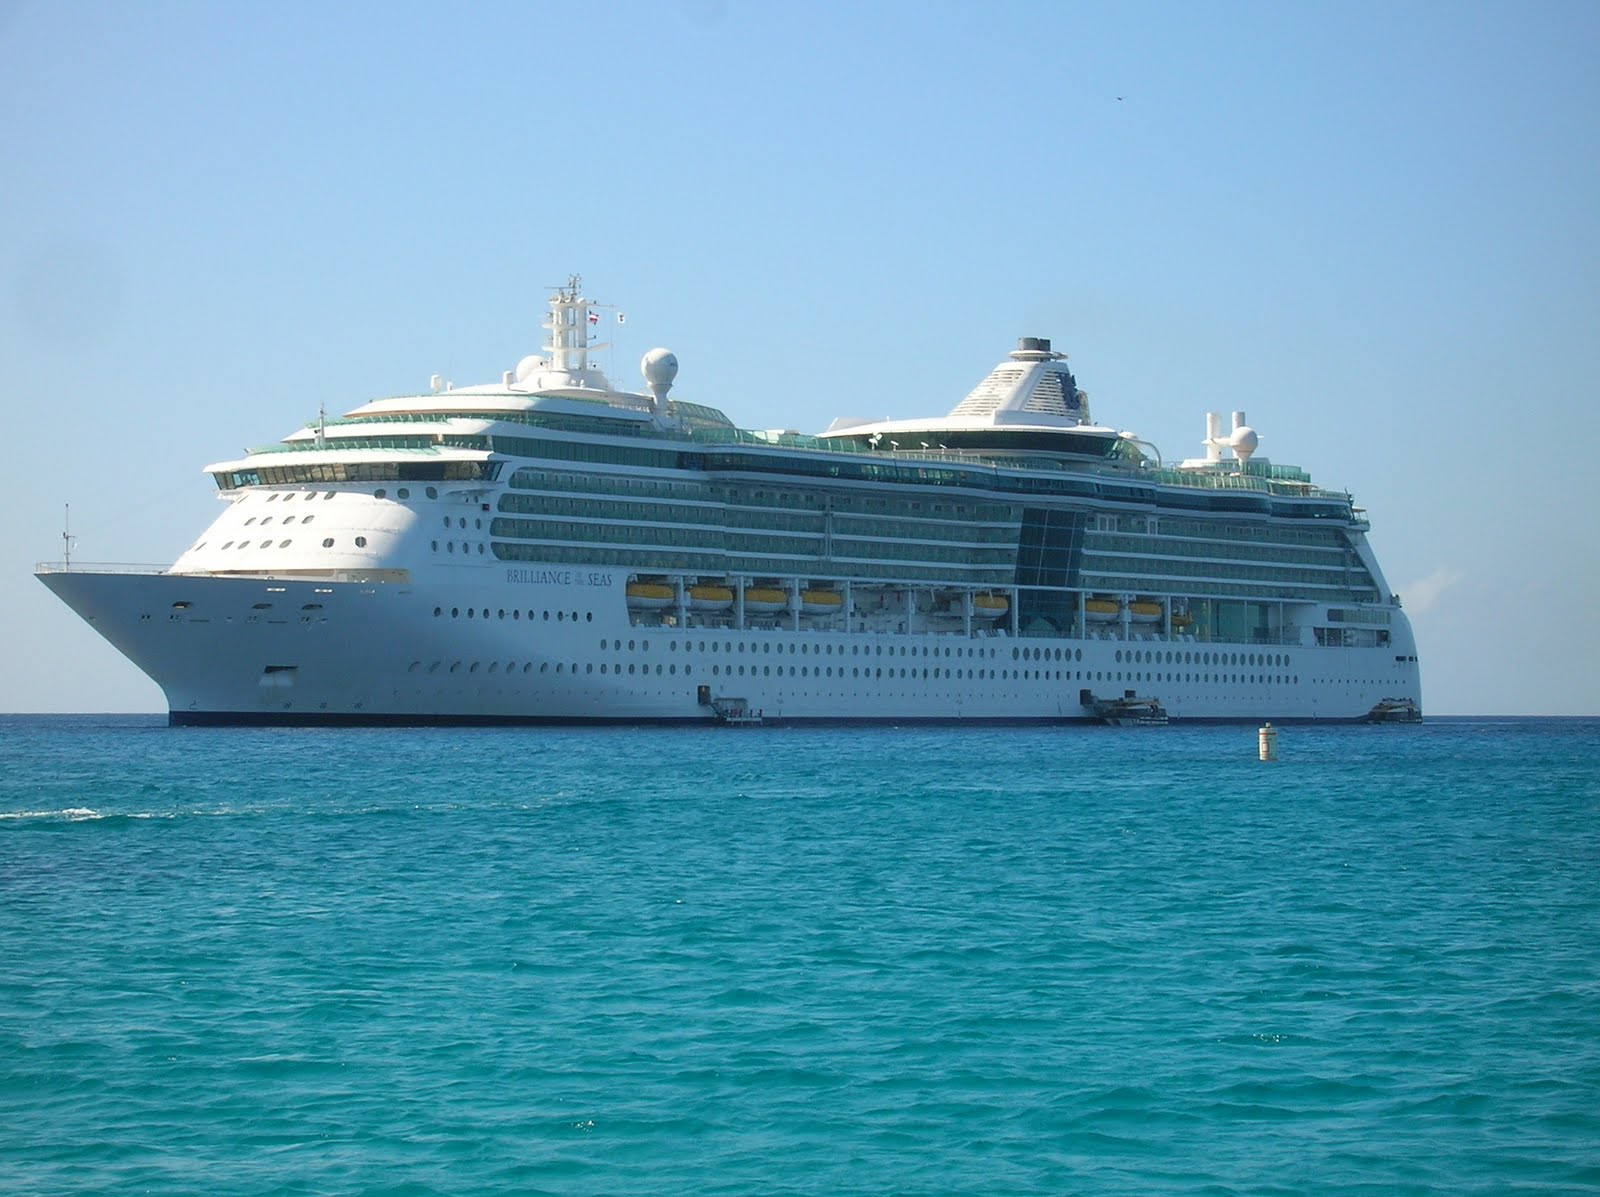 Saturday Interesting Itineraries 1 The American Cruise